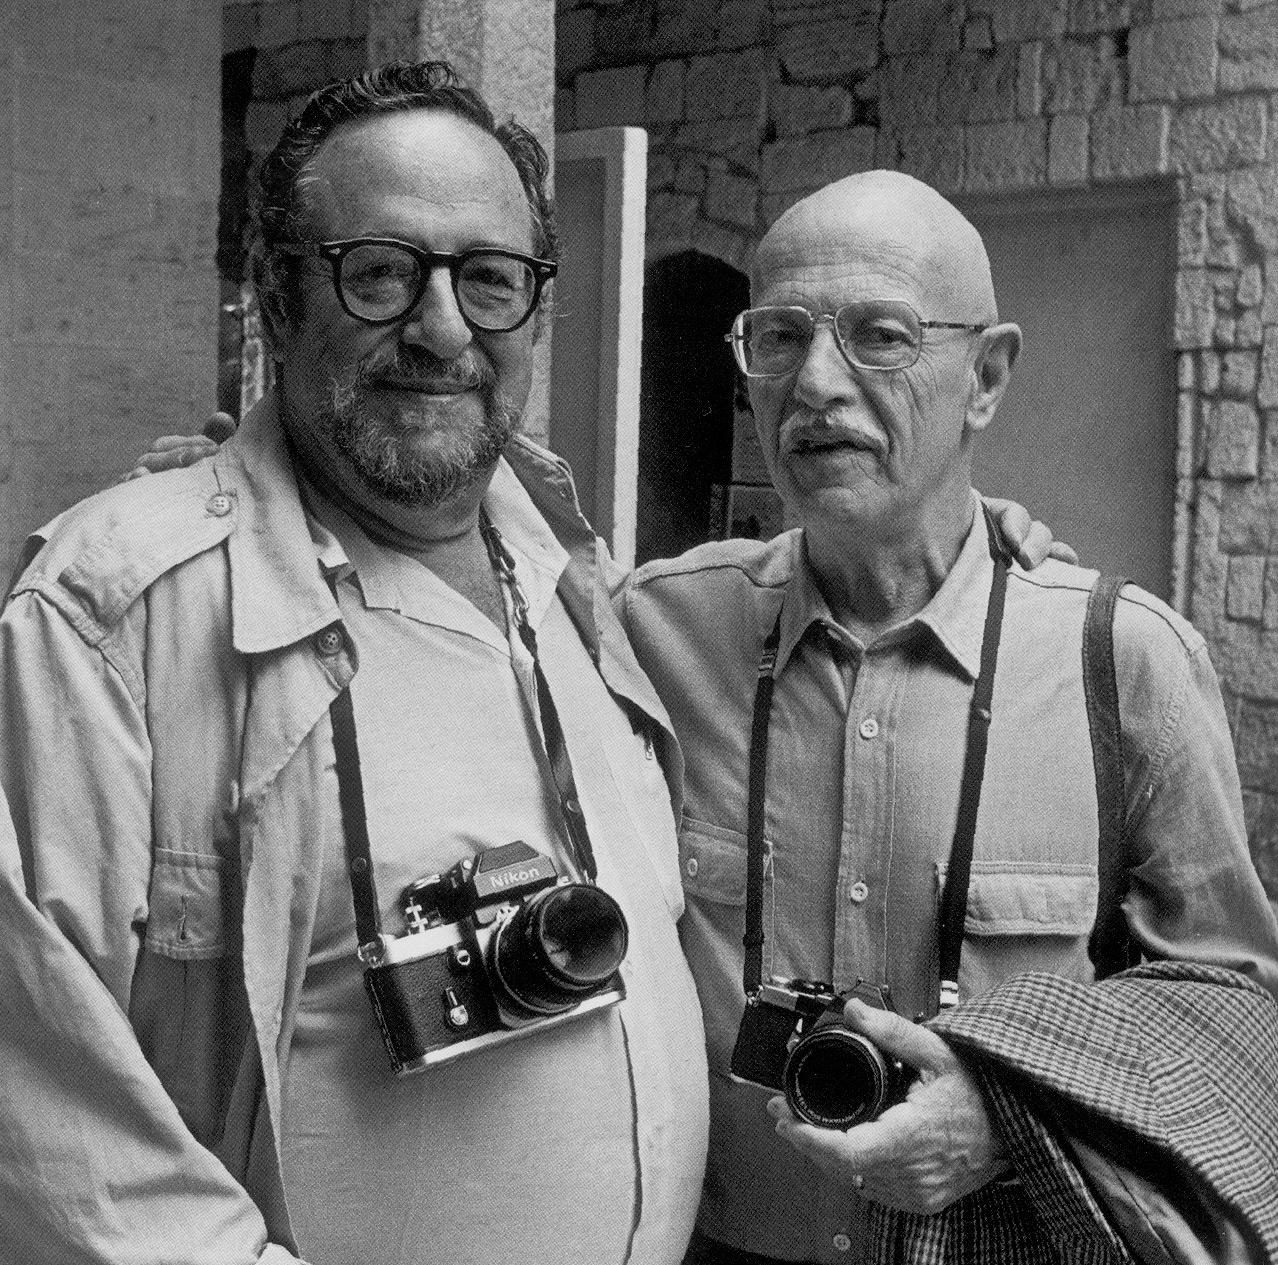 1985. Арнольд Ньюман и Вилли Рони. Арль